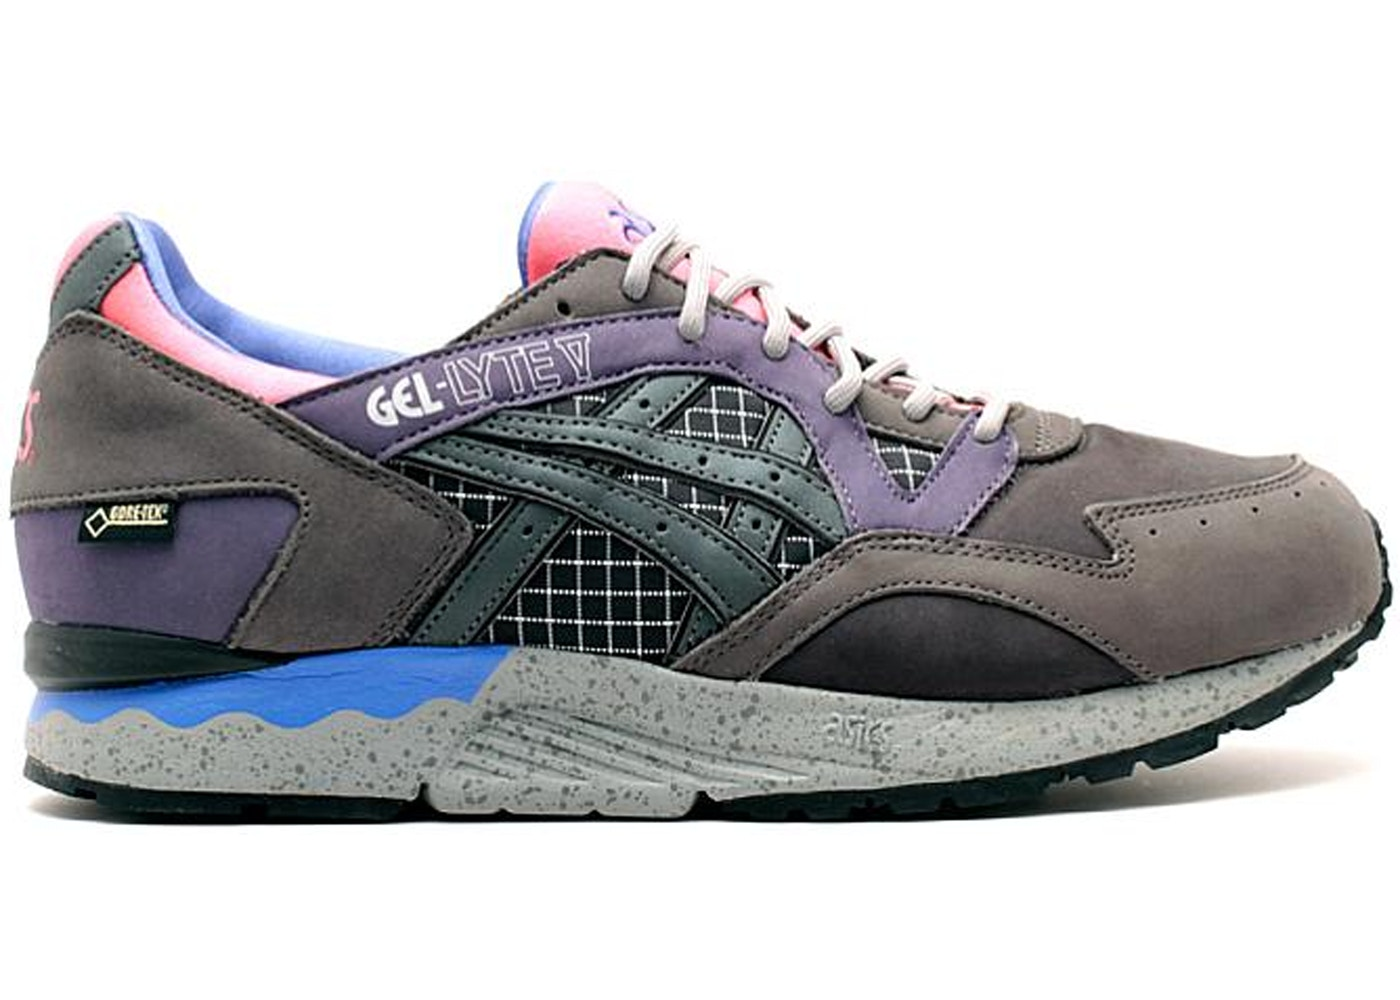 b7376eee93 ASICS Gel-Lyte V Packer Shoes x Gore-tex Charcoal